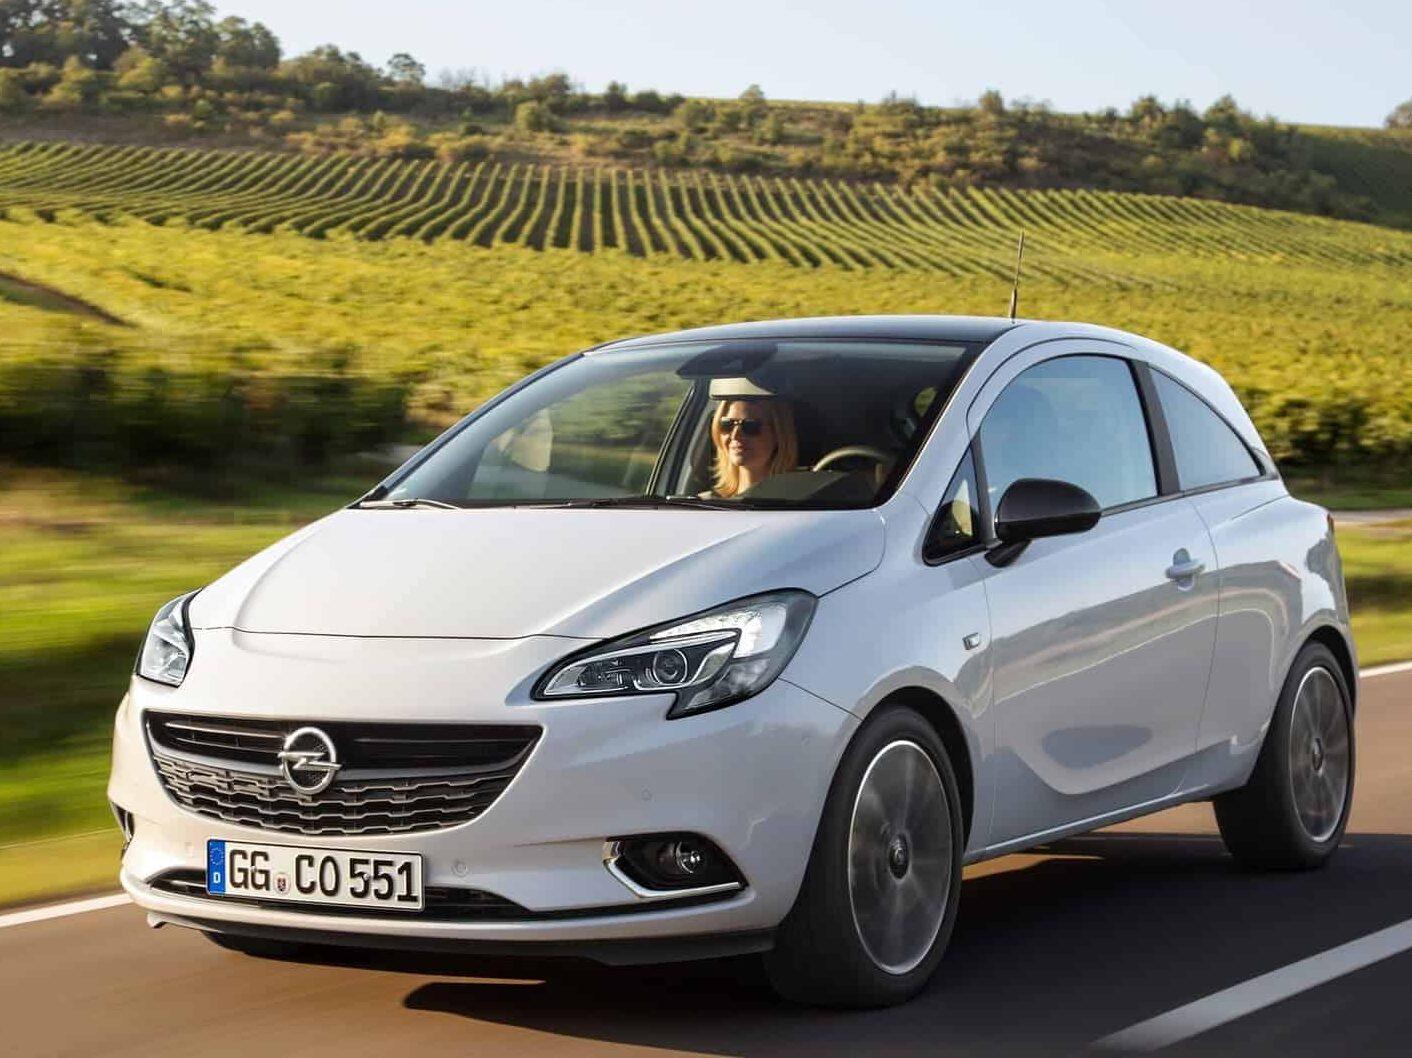 Opel Corsa 2015 автомобиль фото